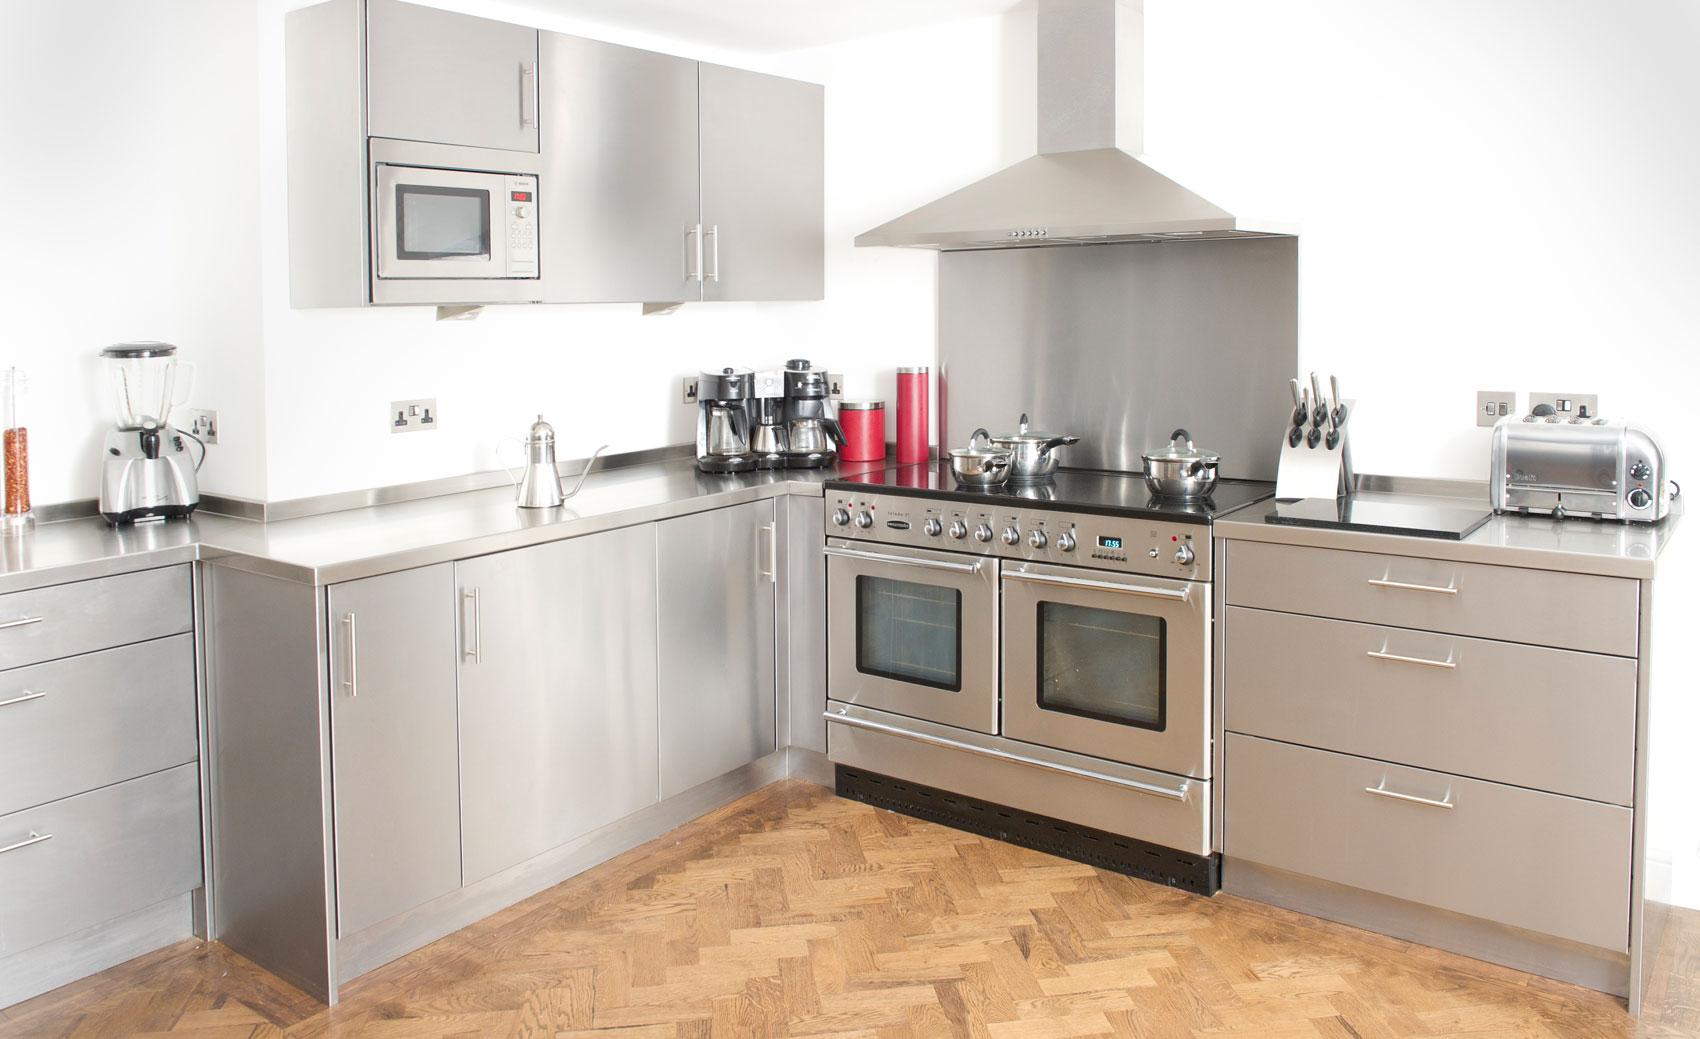 Stainless Steel Kitchen Cabinet, Worktops U0026 Splash Backs UK | Cavendish  Equipment